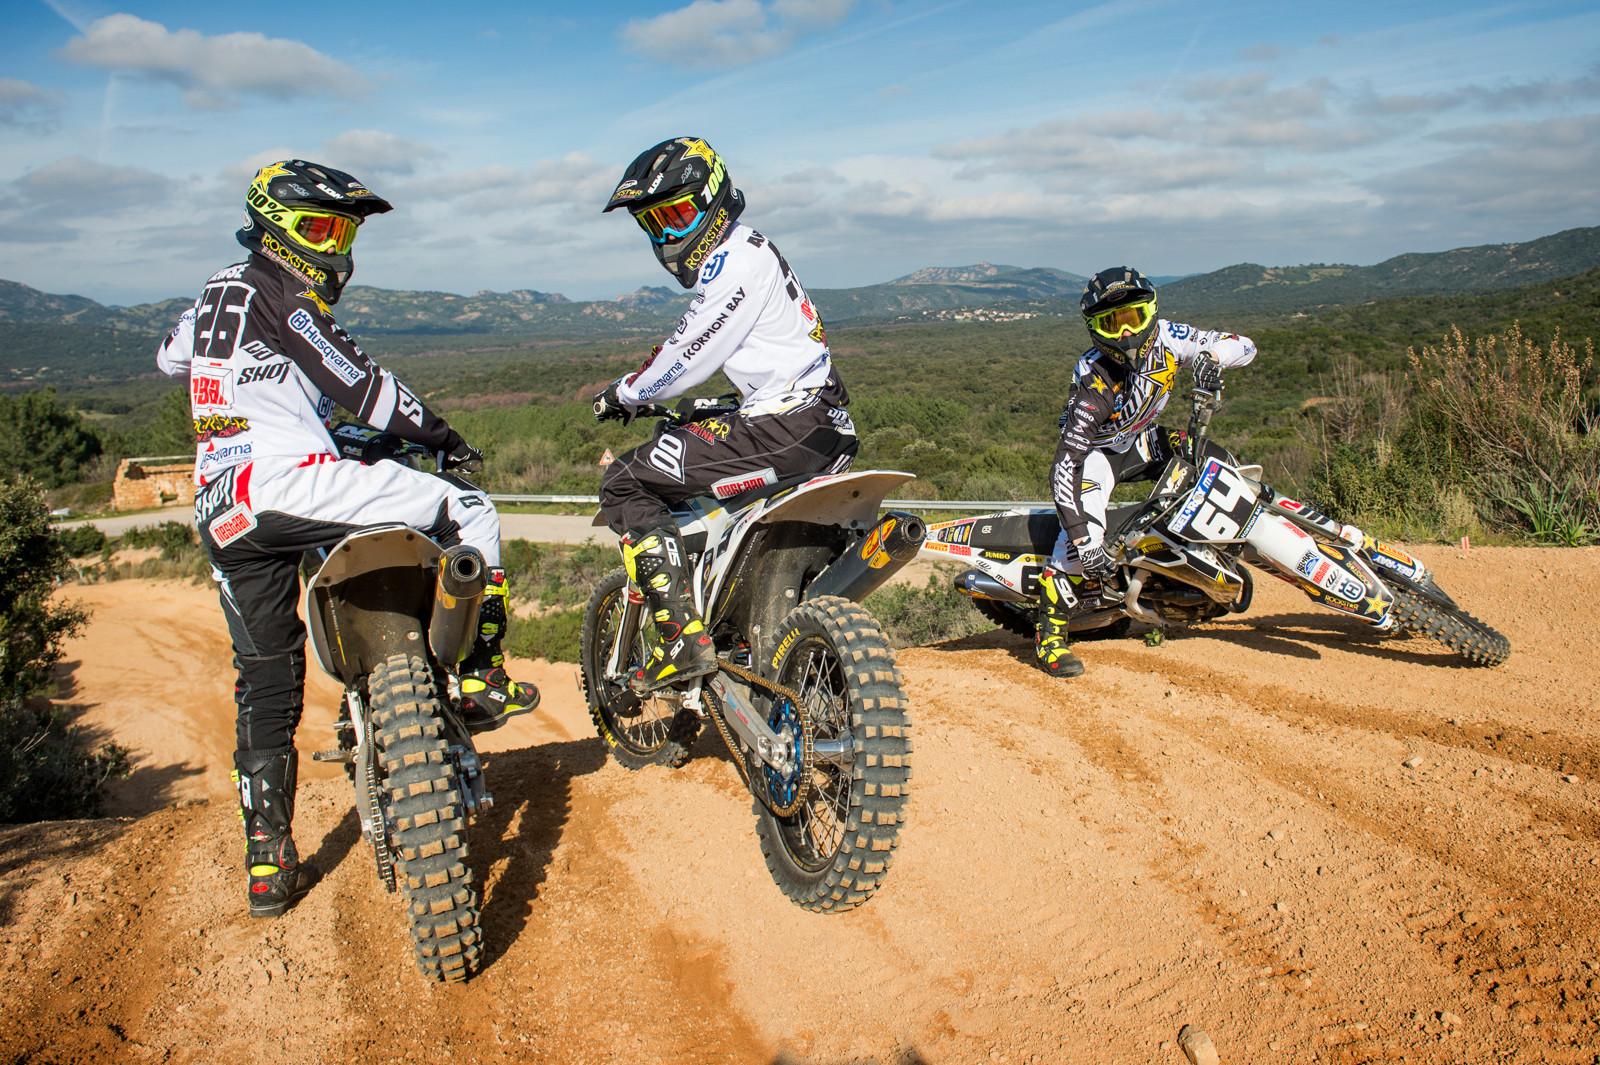 Conrad Mewse, Thomas Covington, and Max Anstie. - First Look: Rockstar Energy Husqvarna Factory Racing MX2 - Motocross Pictures - Vital MX